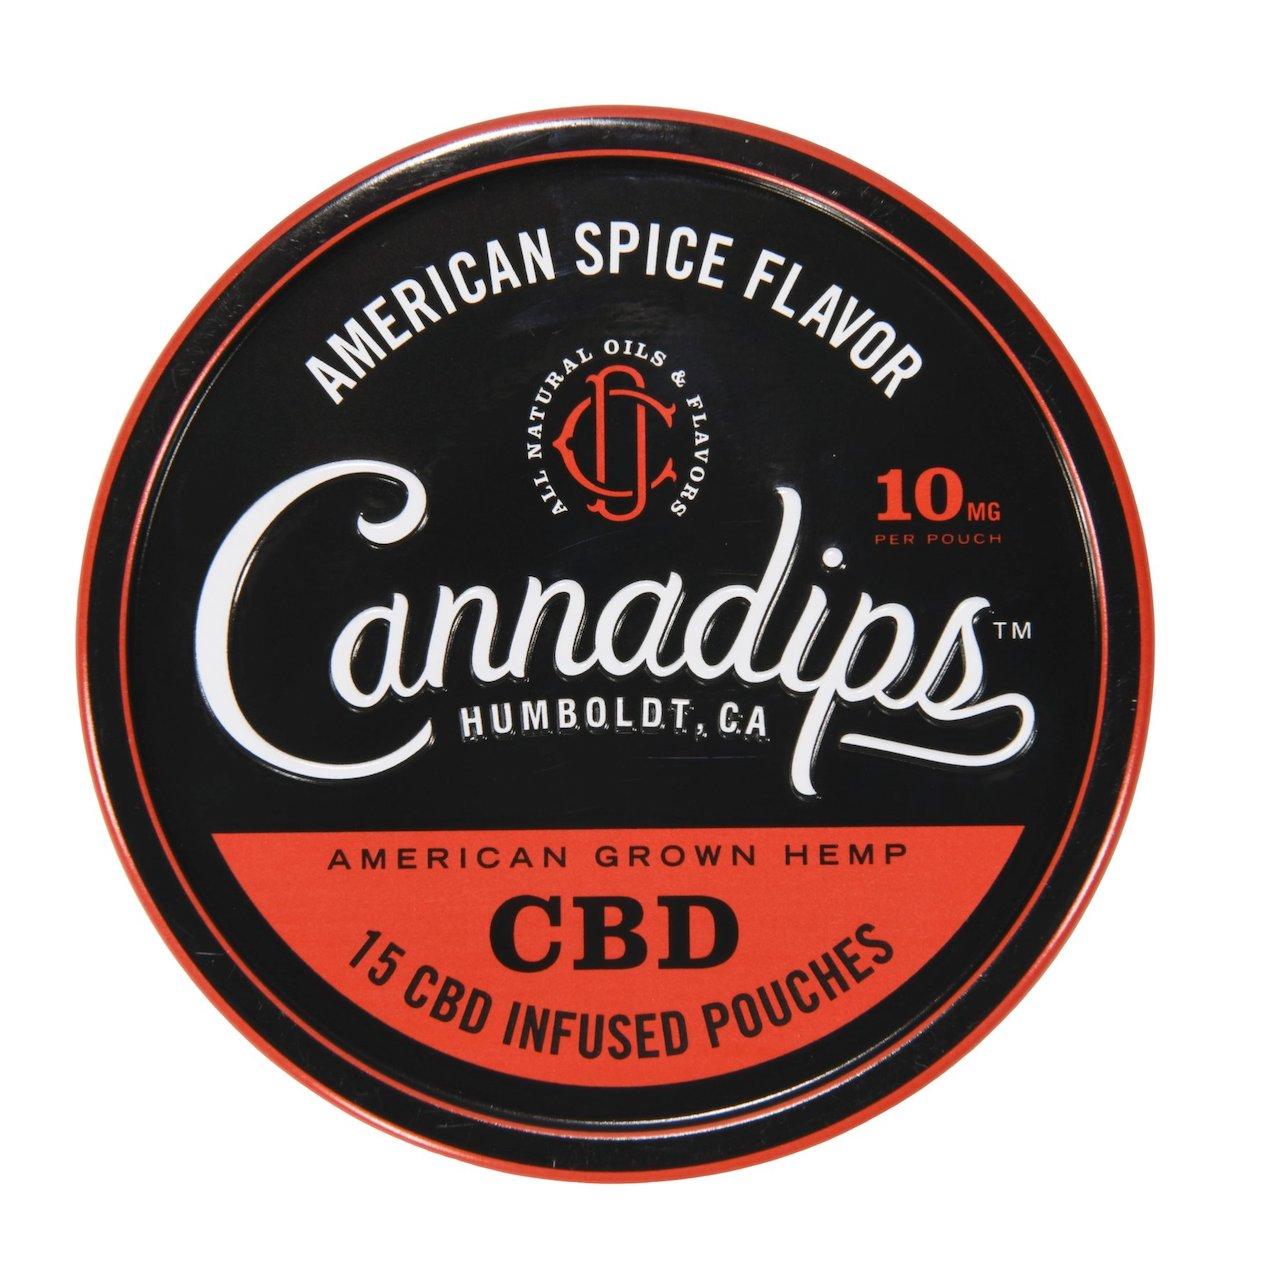 CBD cannadips - American Spice